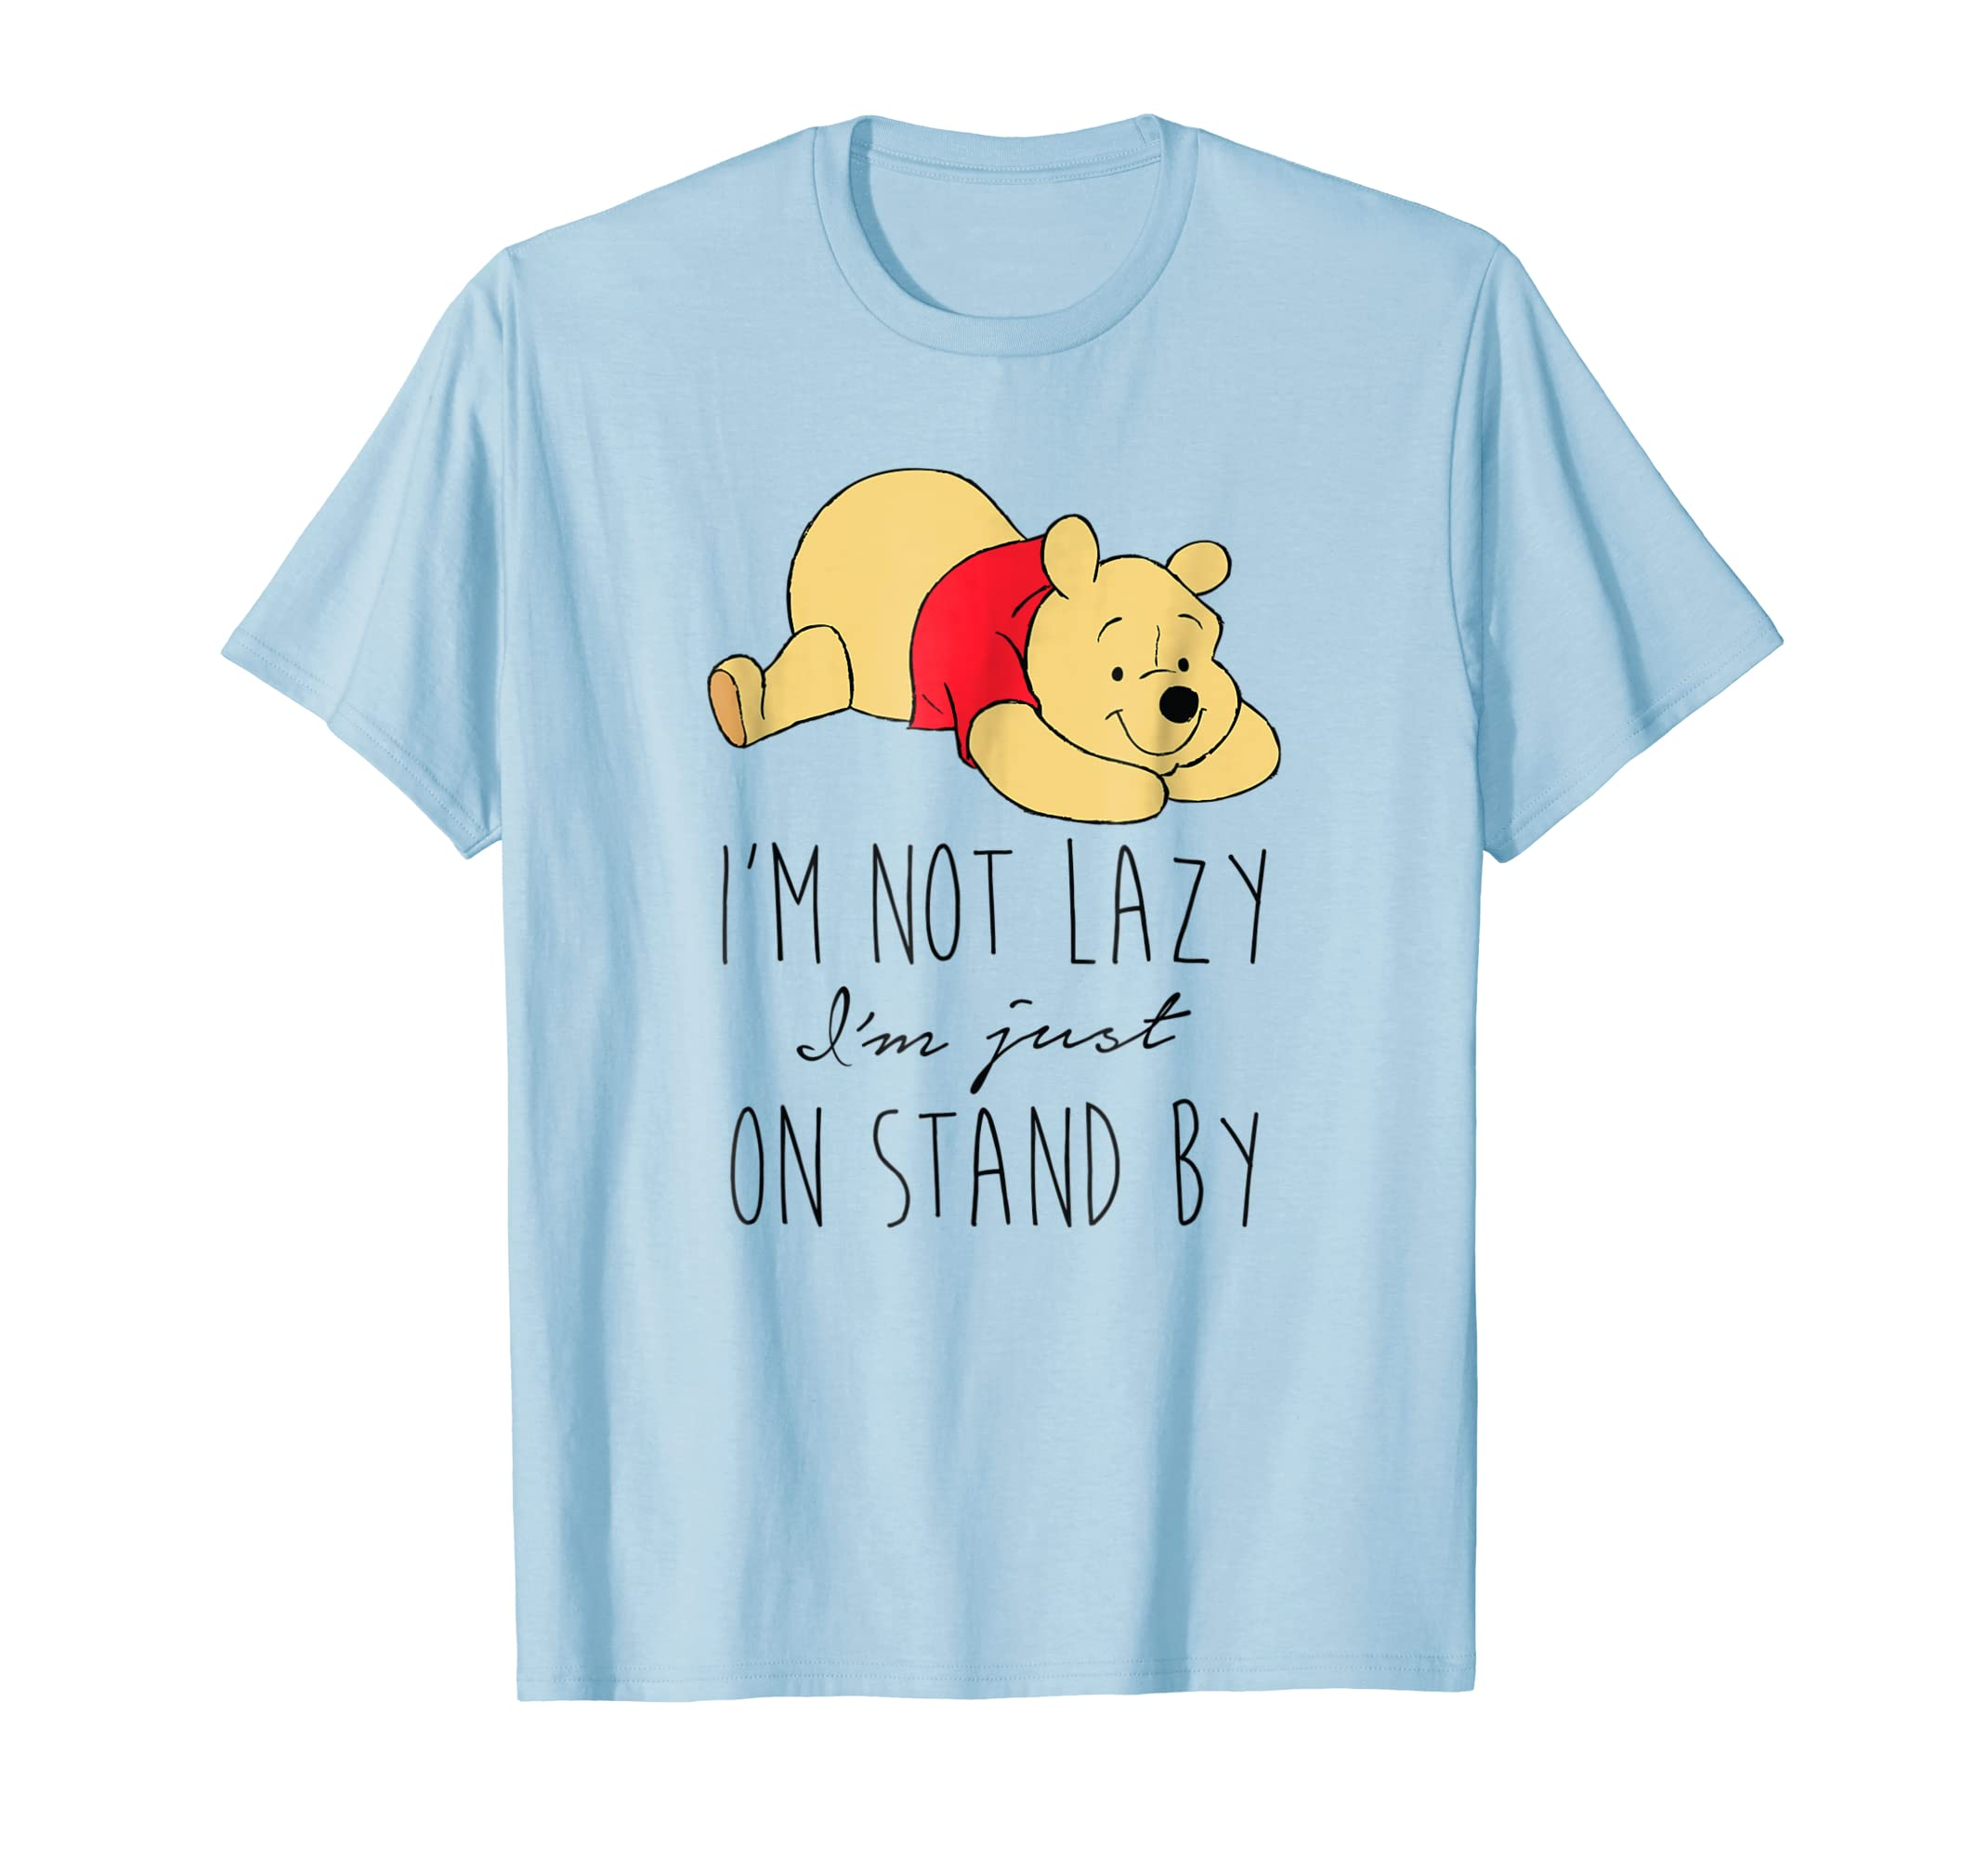 9de6f1cee937 Amazon.com  Disney Lazy Winnie the Pooh T Shirt  Clothing